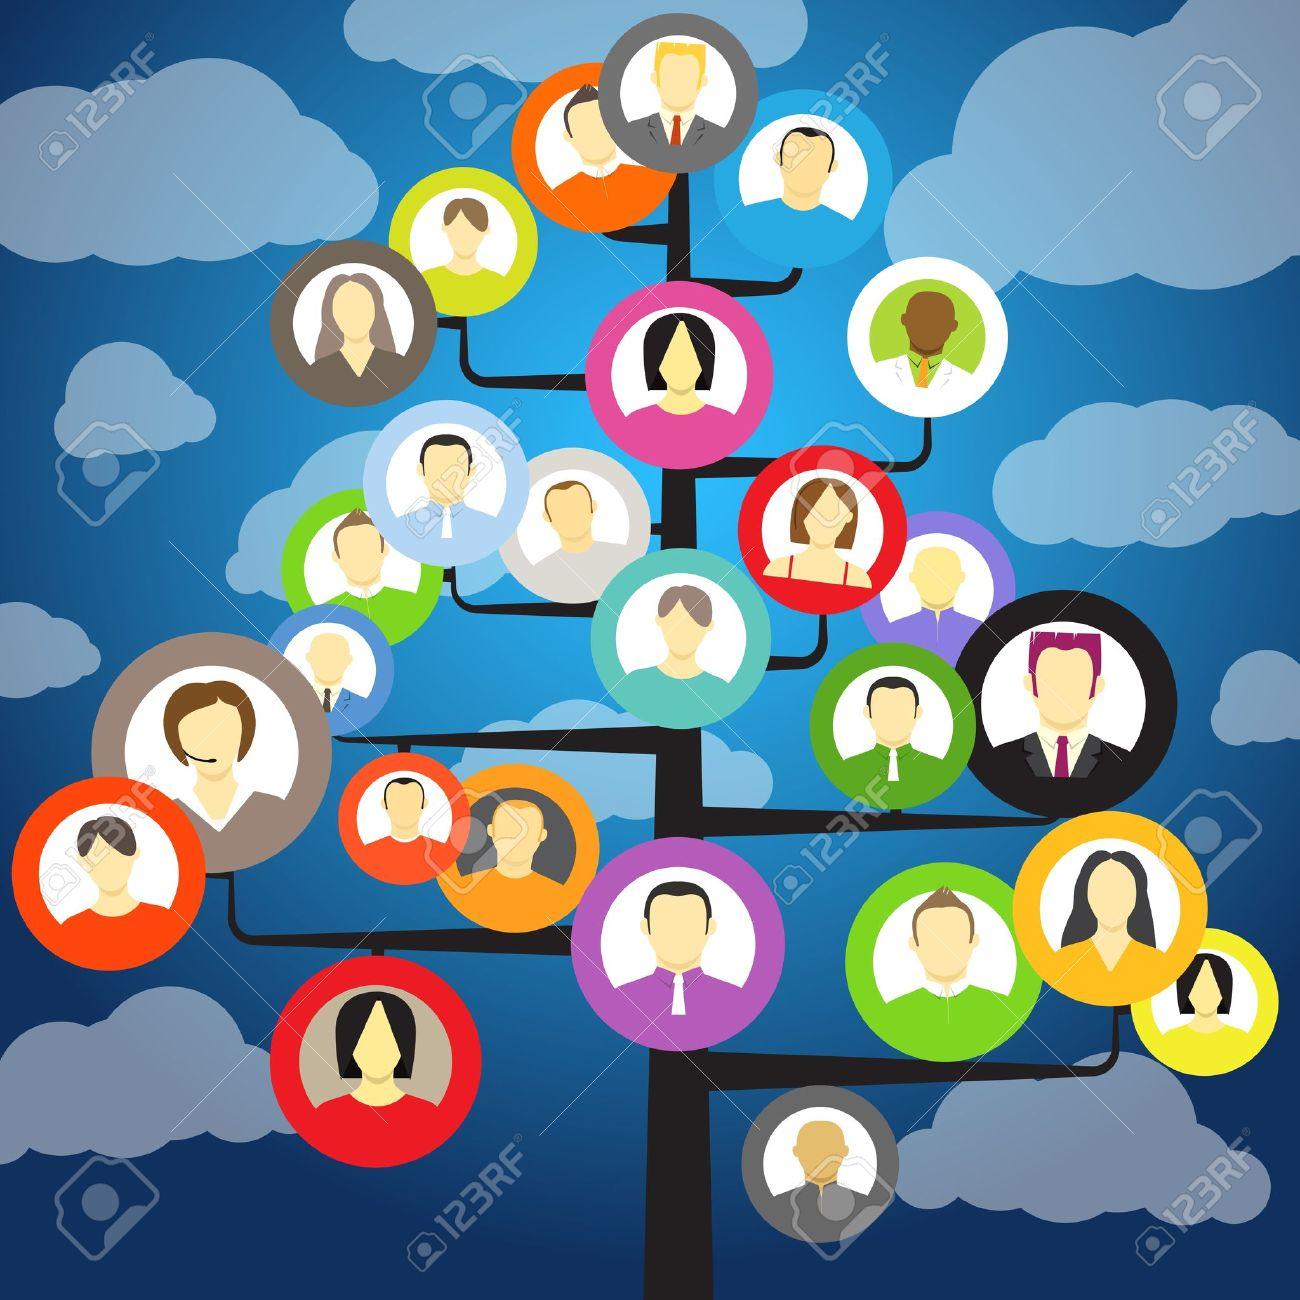 Family Tree Cartoon Images Family Tree Images Stock